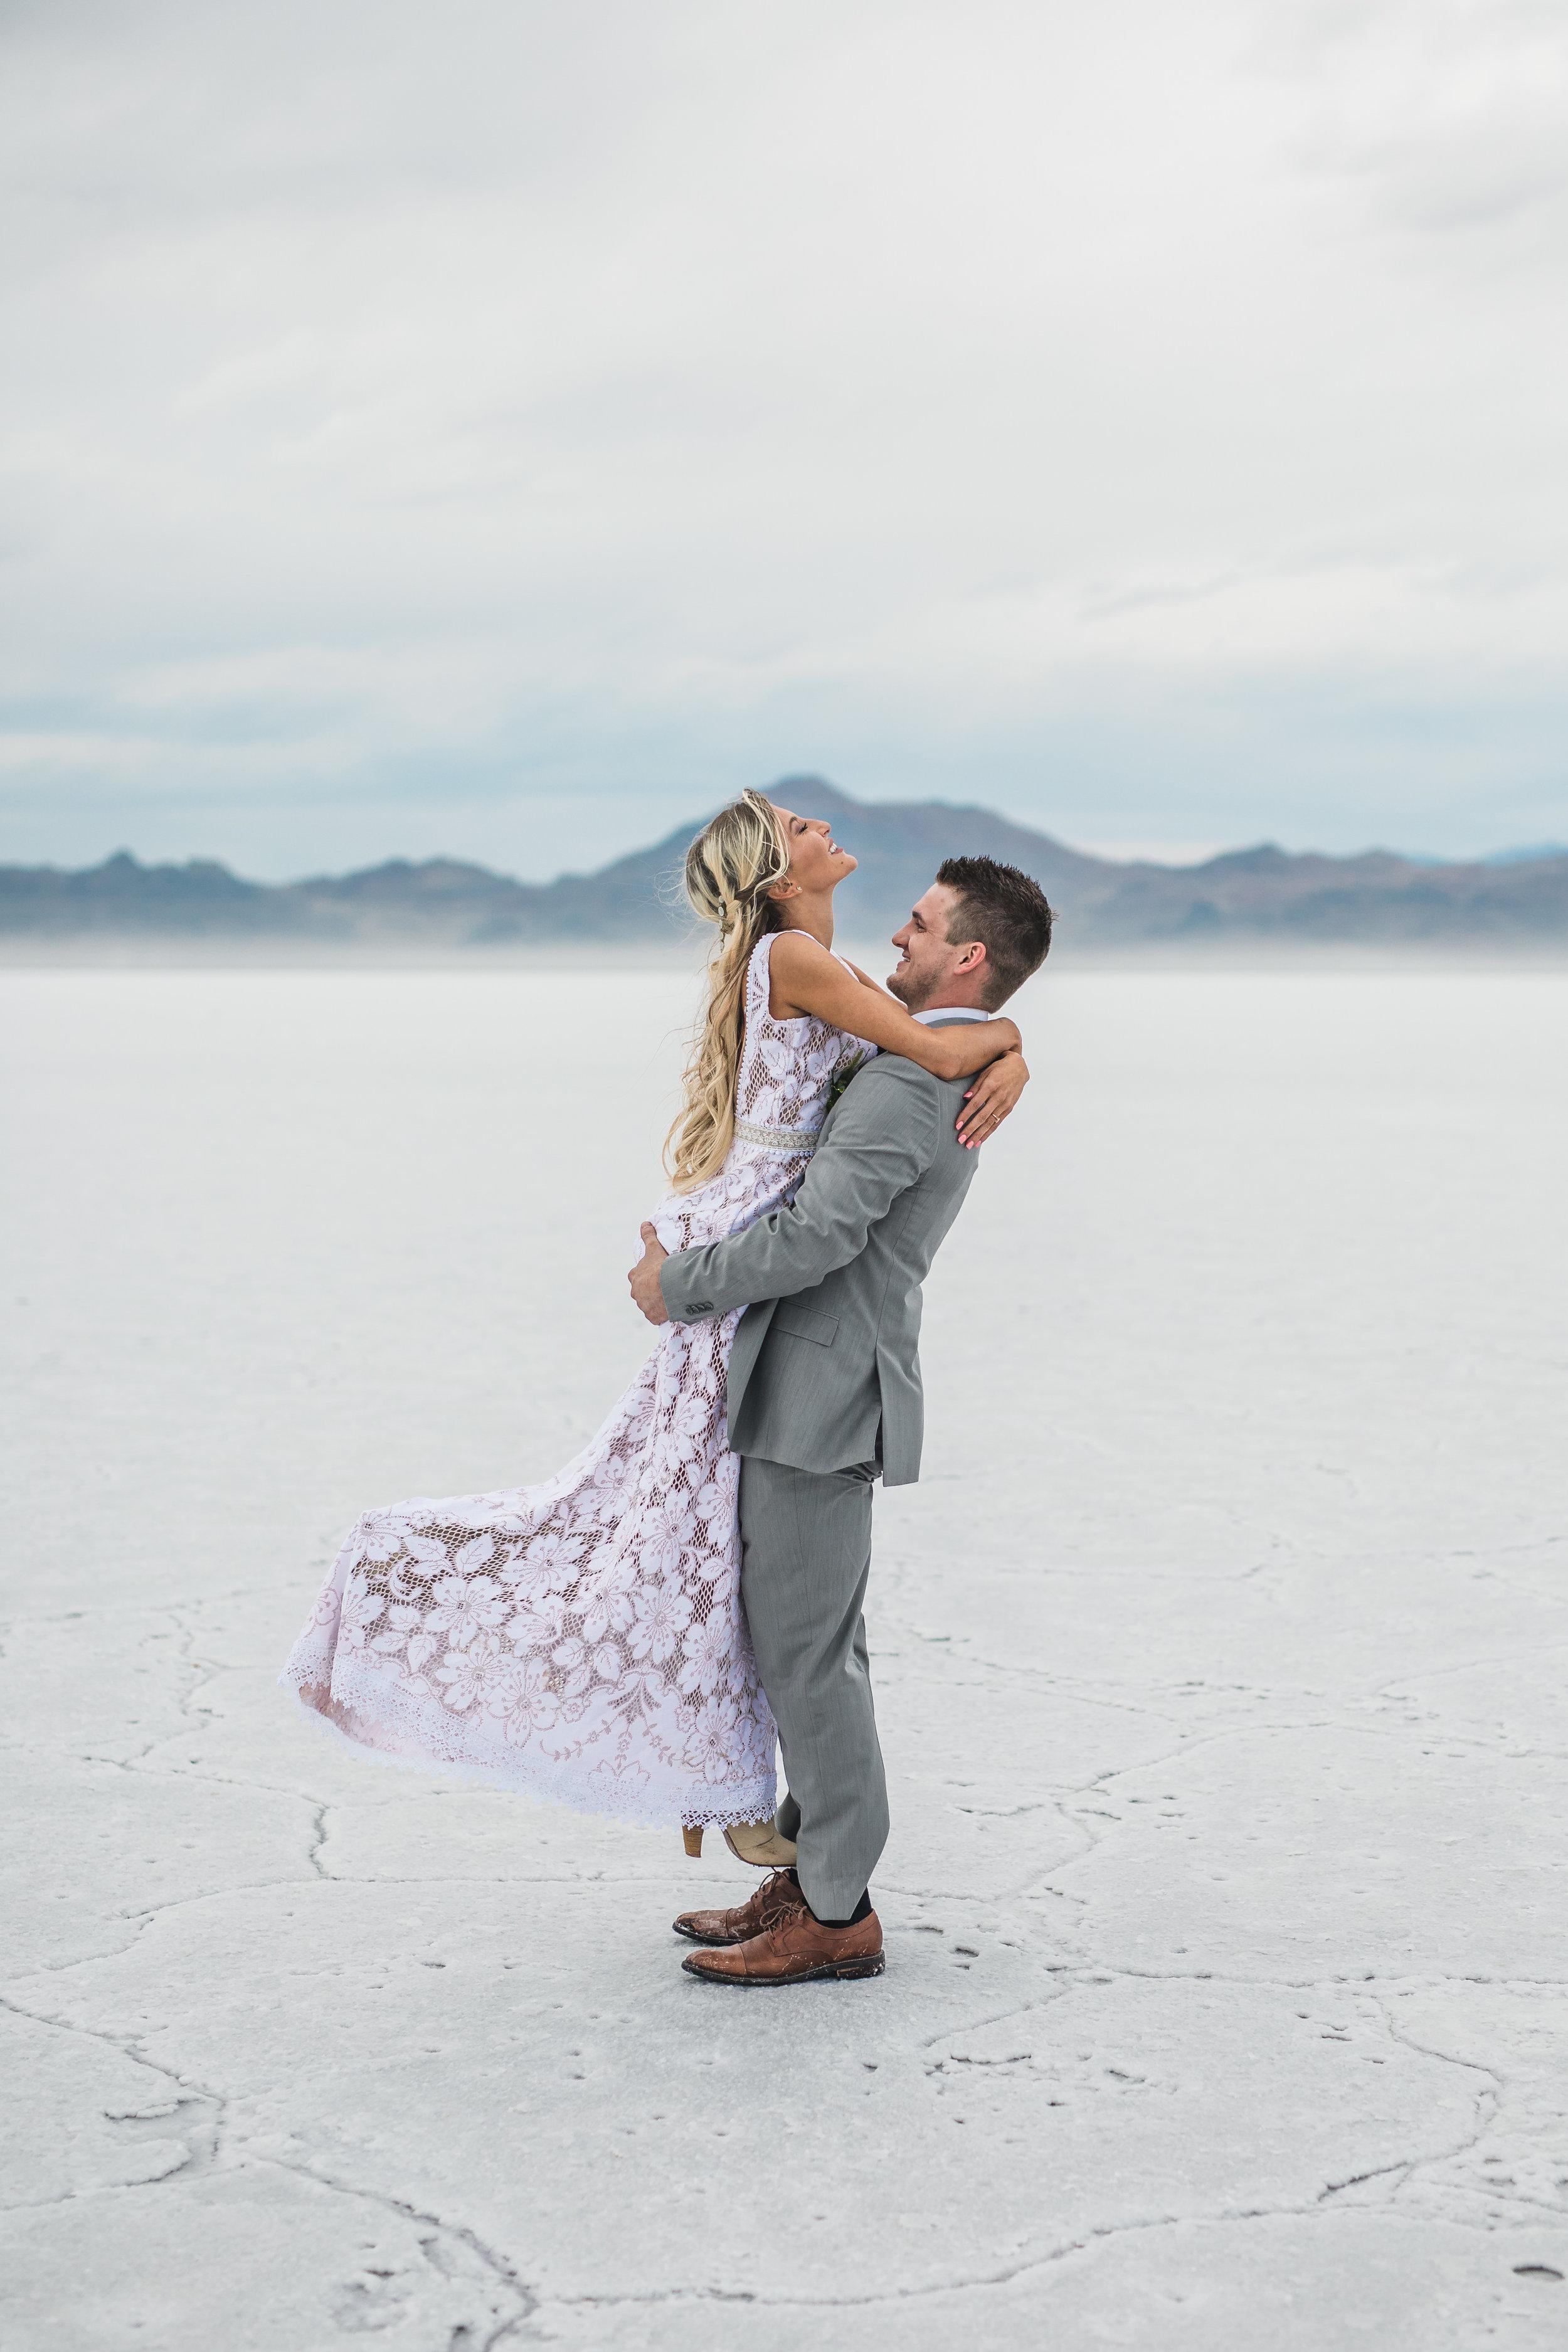 Bonneville Salt Flats adventure elopement Utah wedding photographers